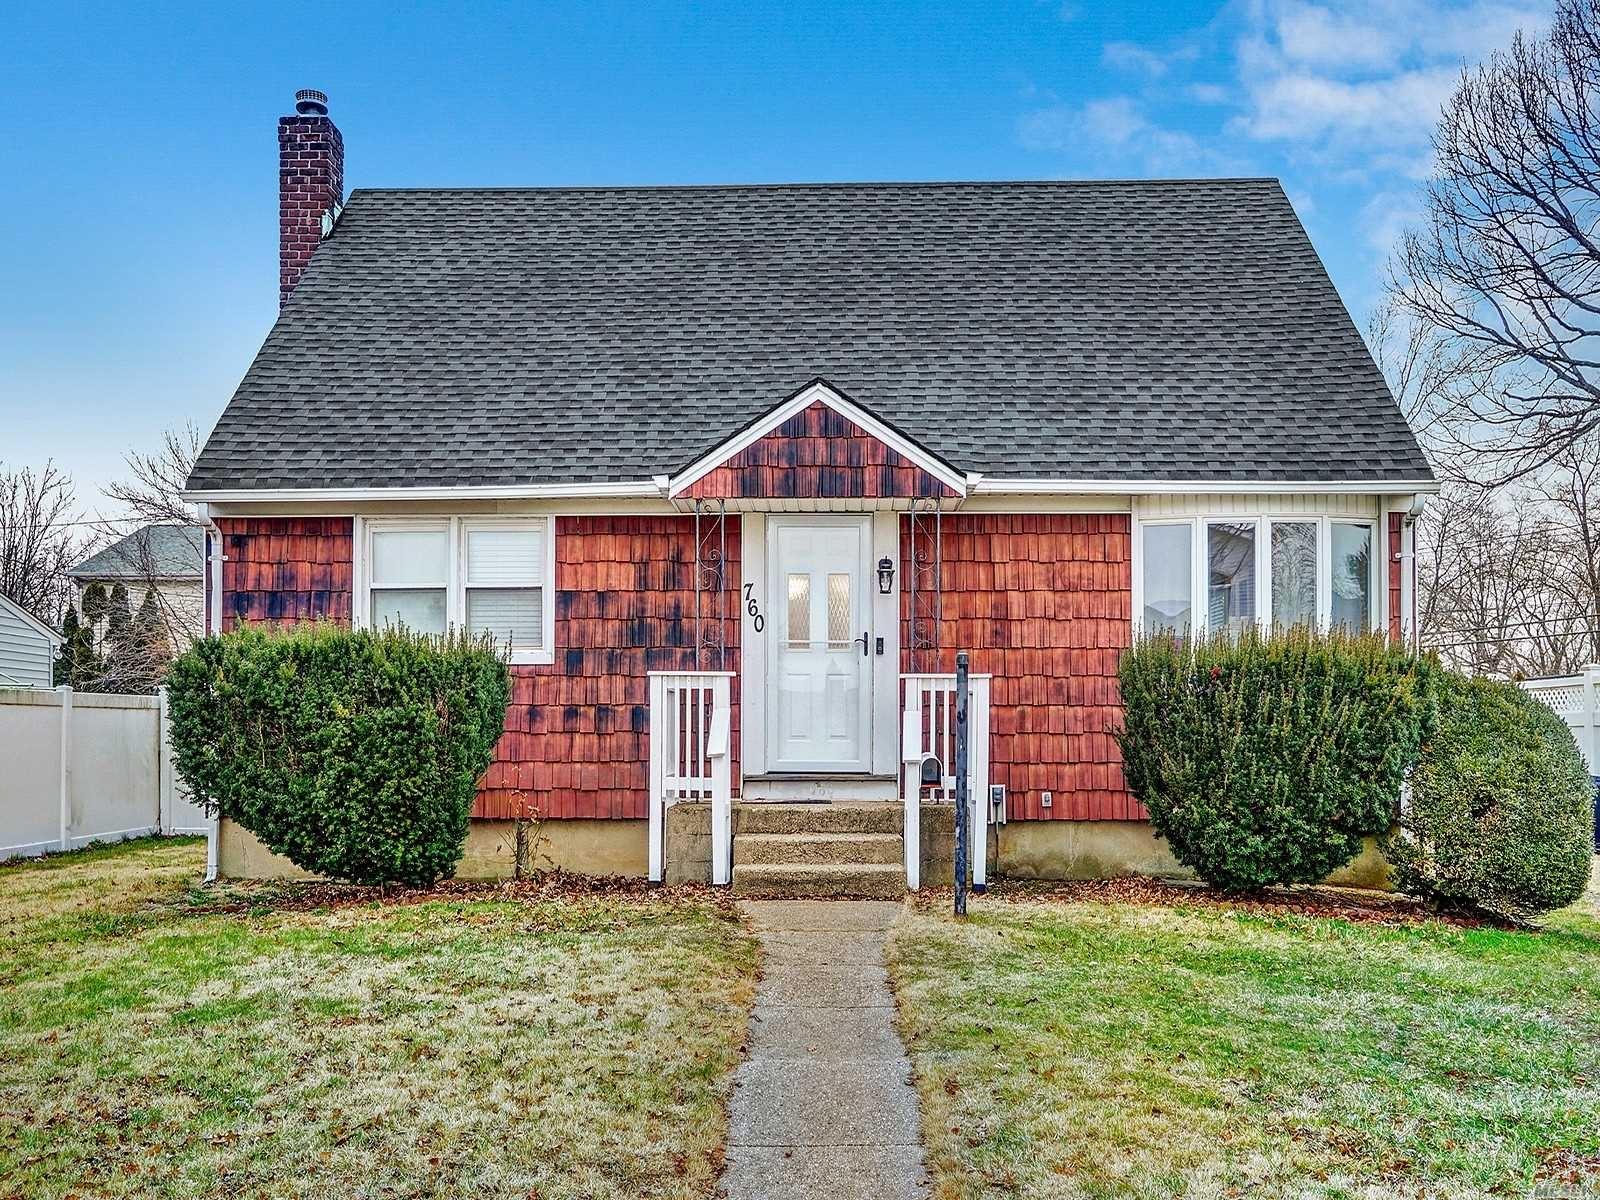 760 Flowerdale Drive, Seaford, NY 11783 - MLS#: 3190364